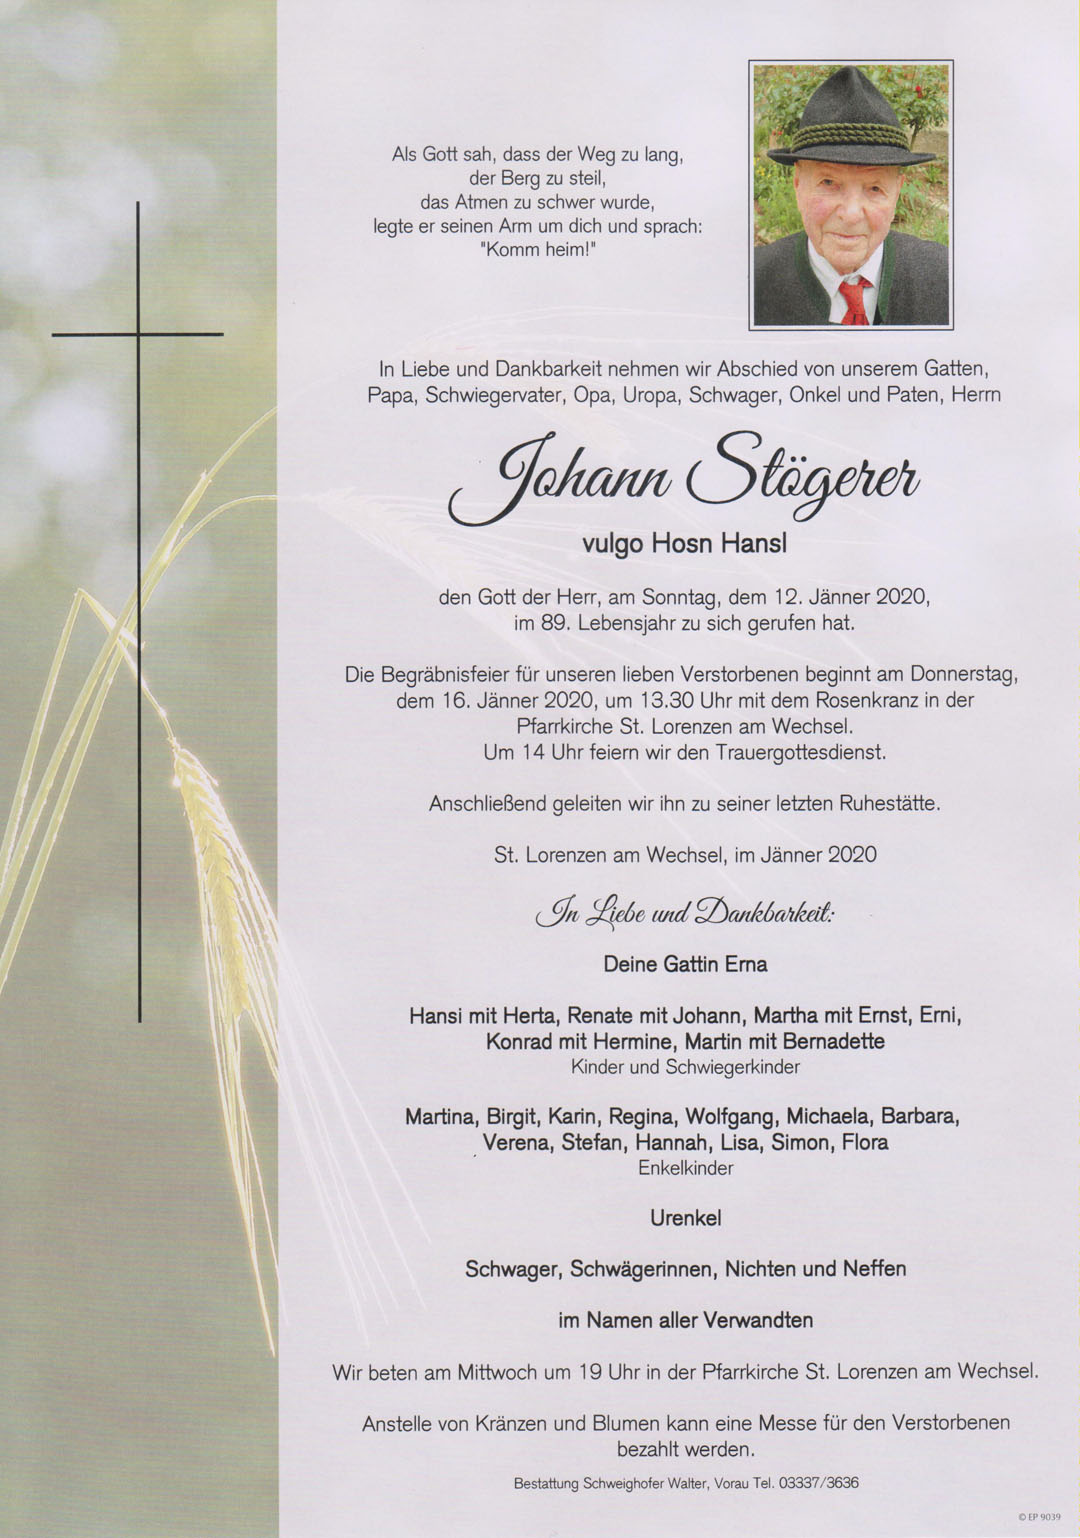 Johann Stögerer